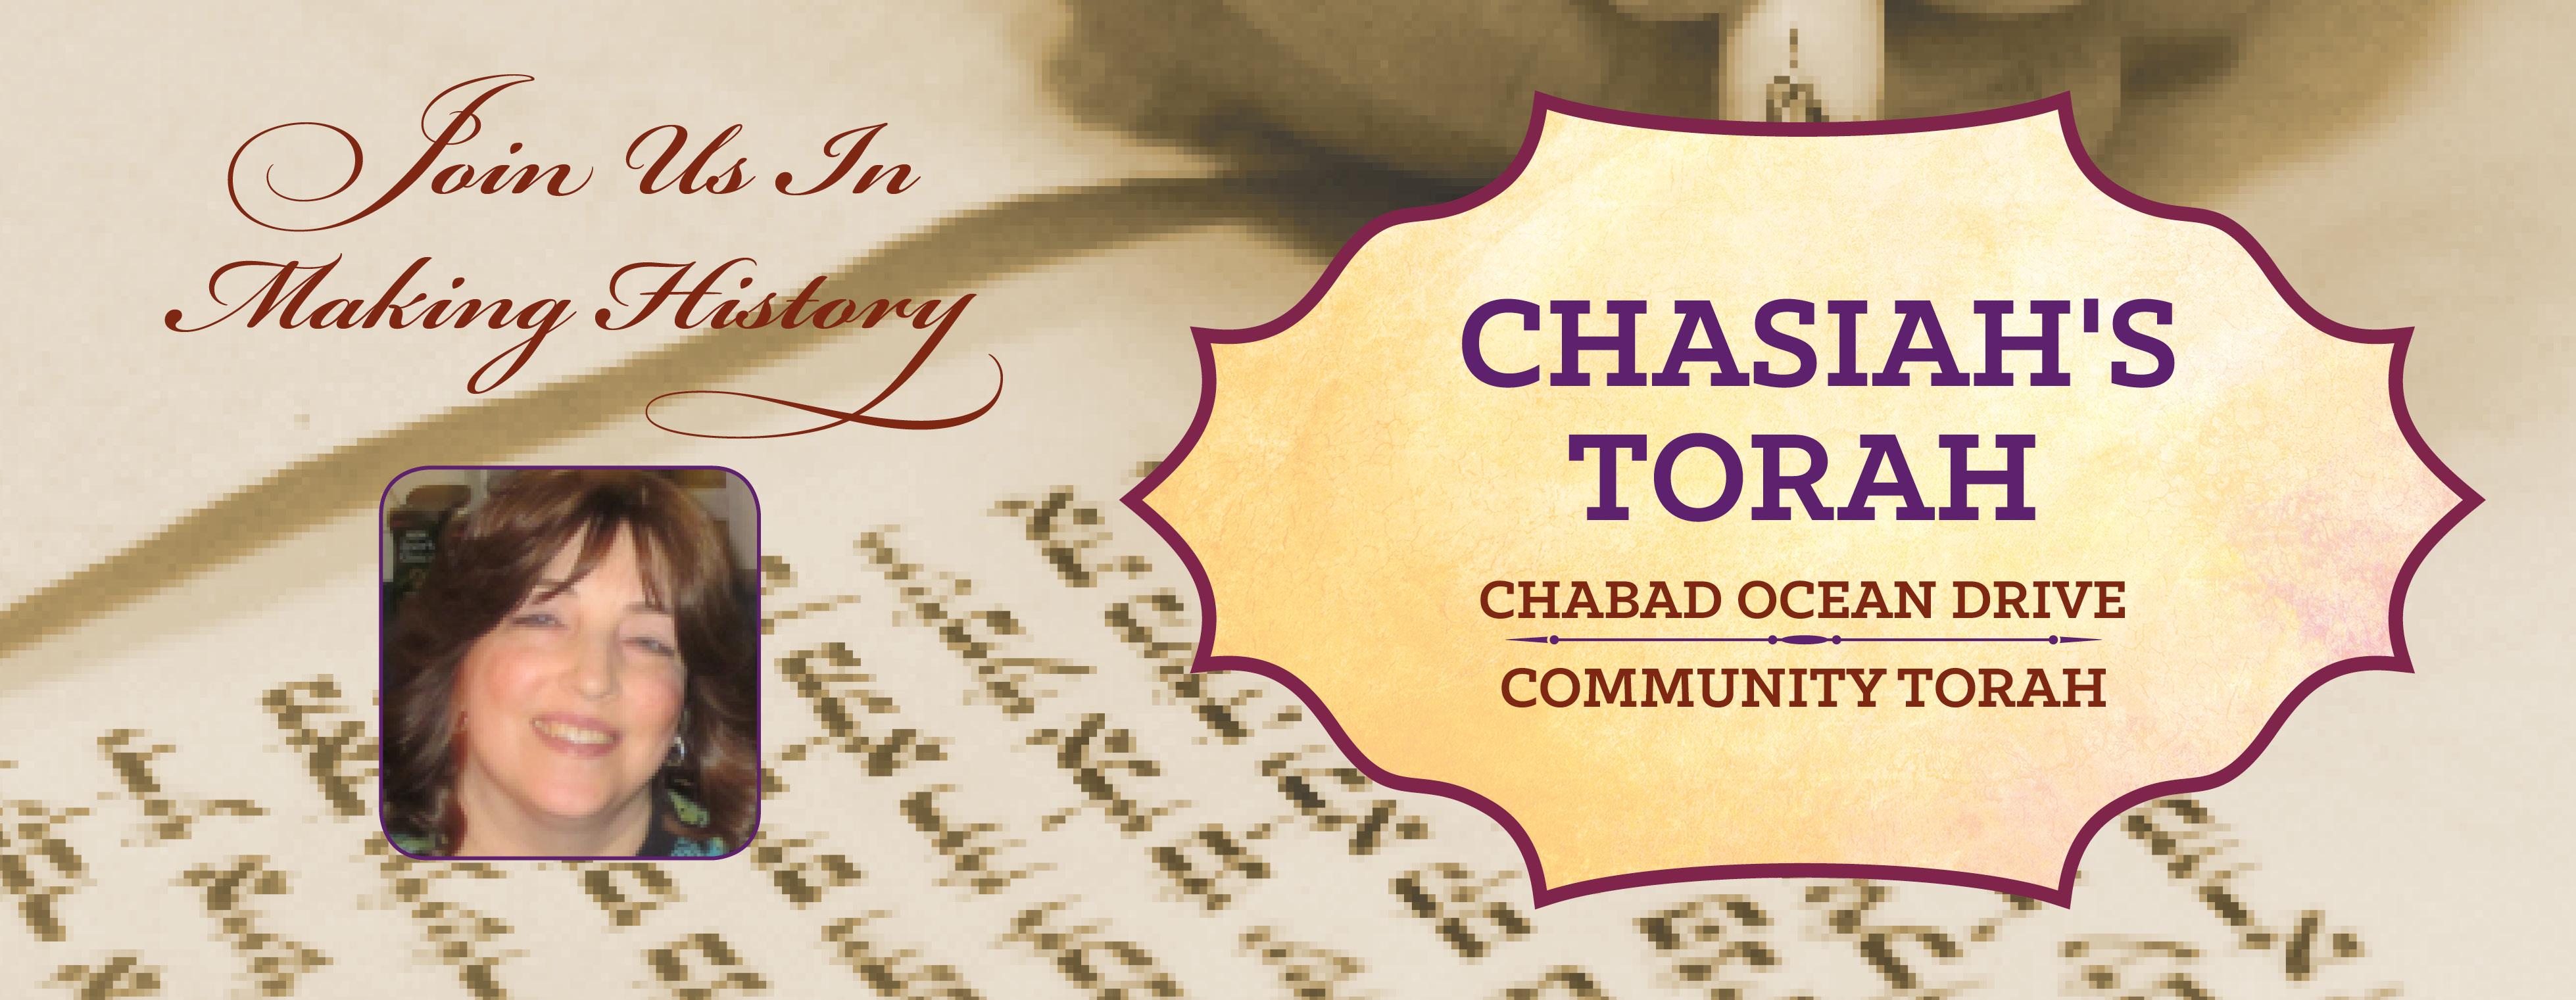 Chabad Ocean Drive Torah Dedication